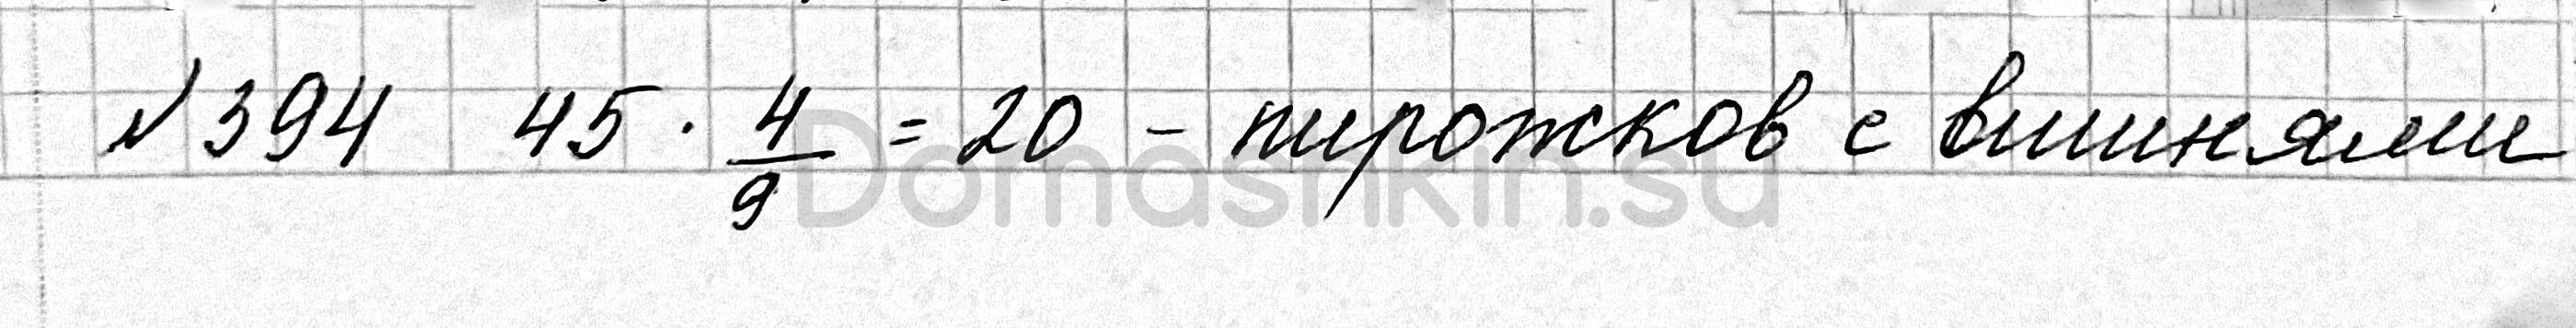 Математика 6 класс учебник Мерзляк номер 394 решение